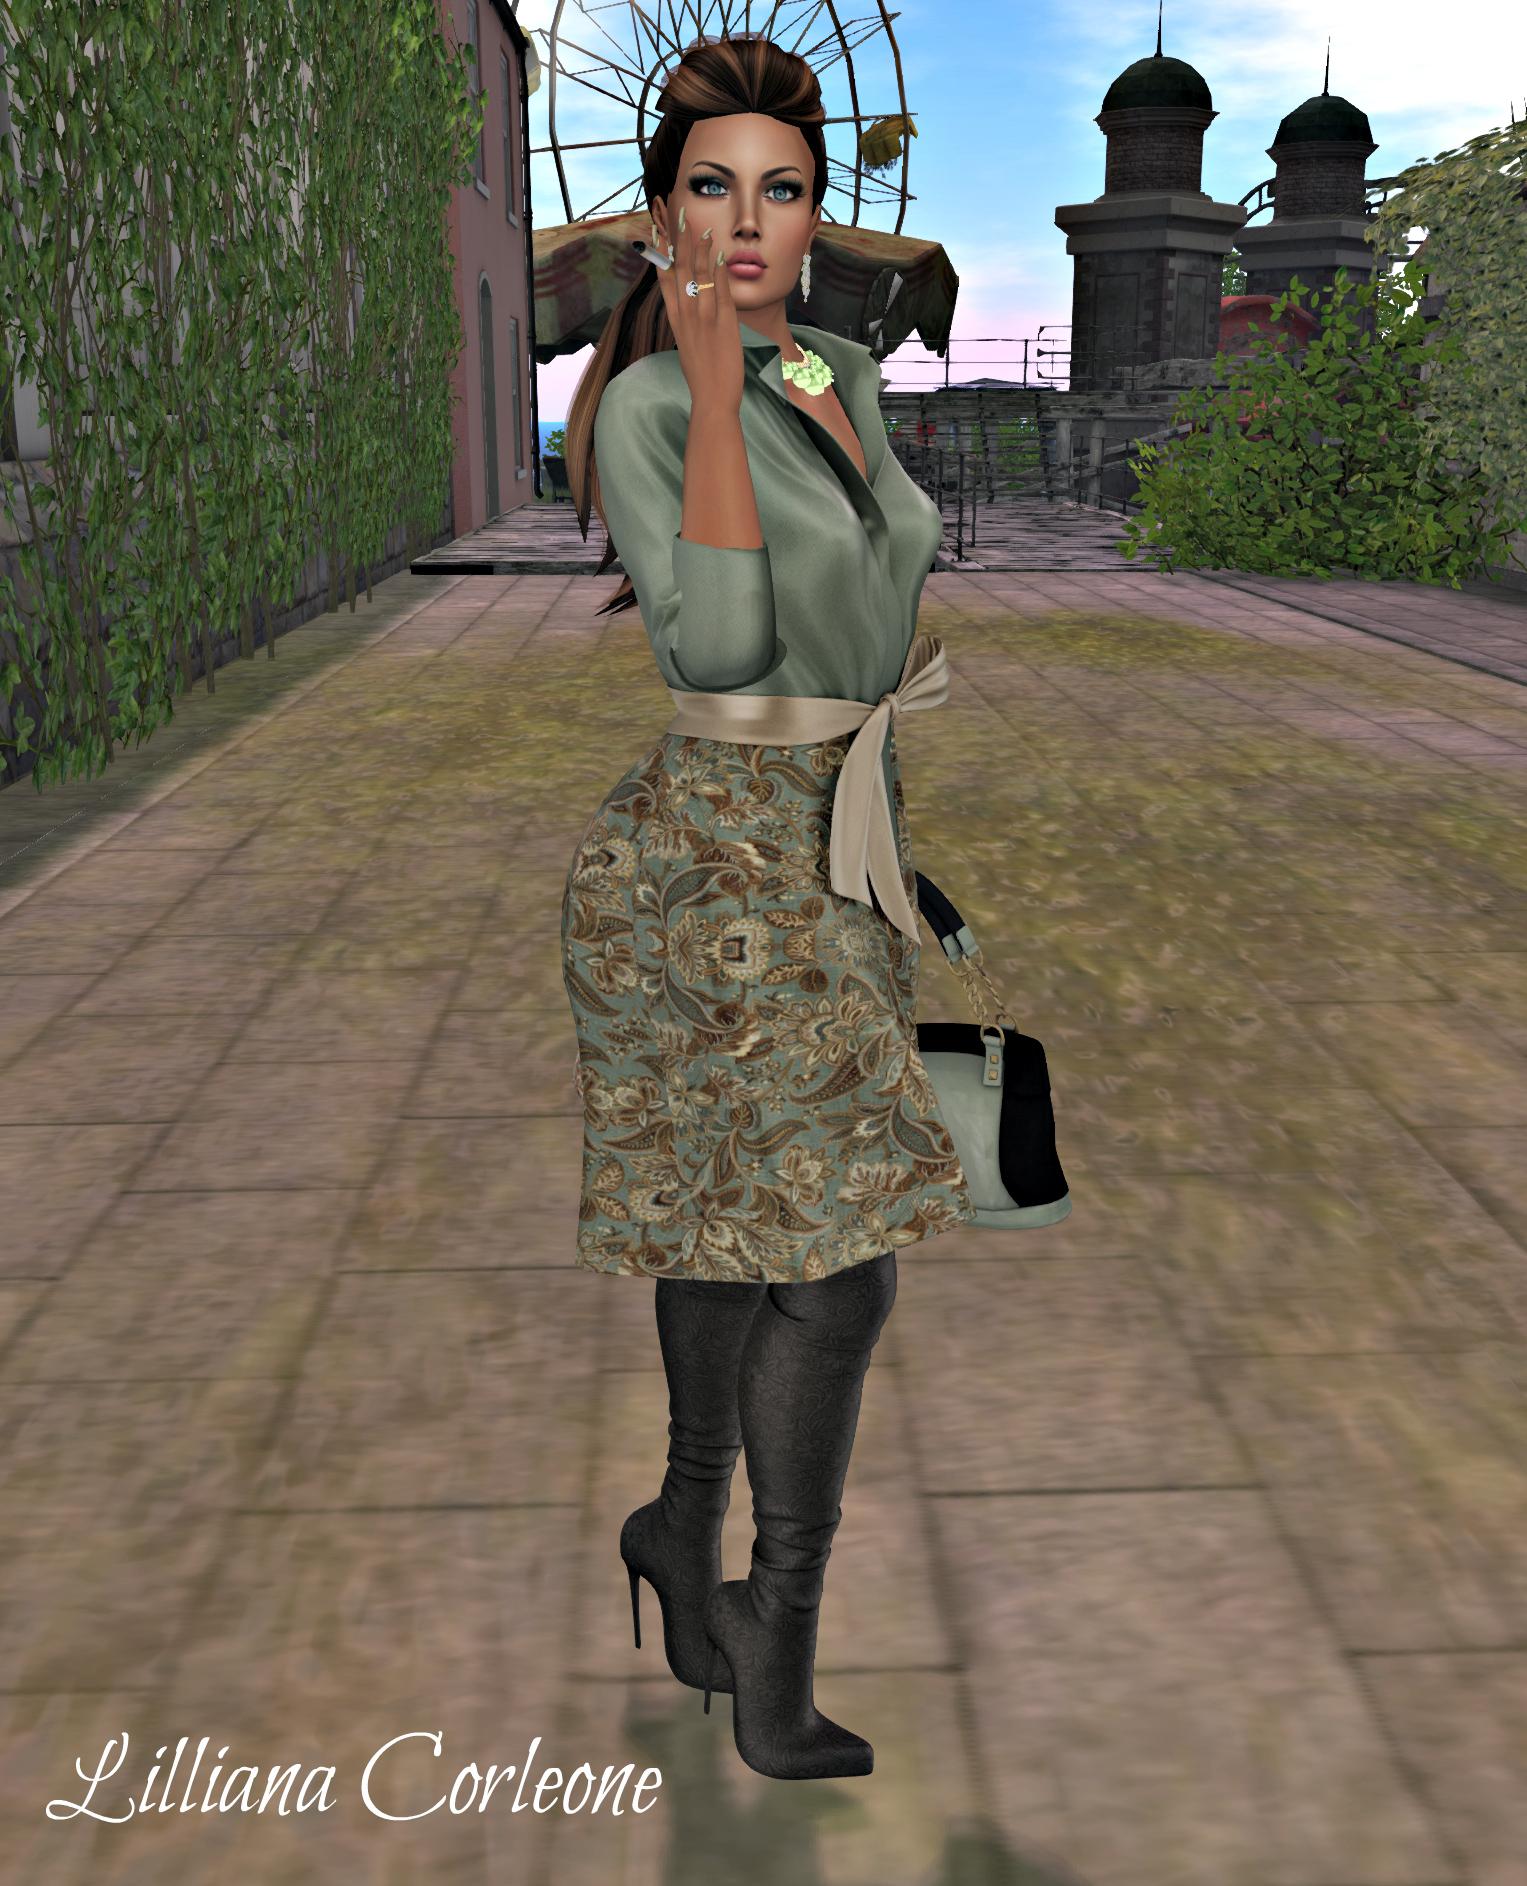 mar-4th-blog-post-photo-2m_cropped